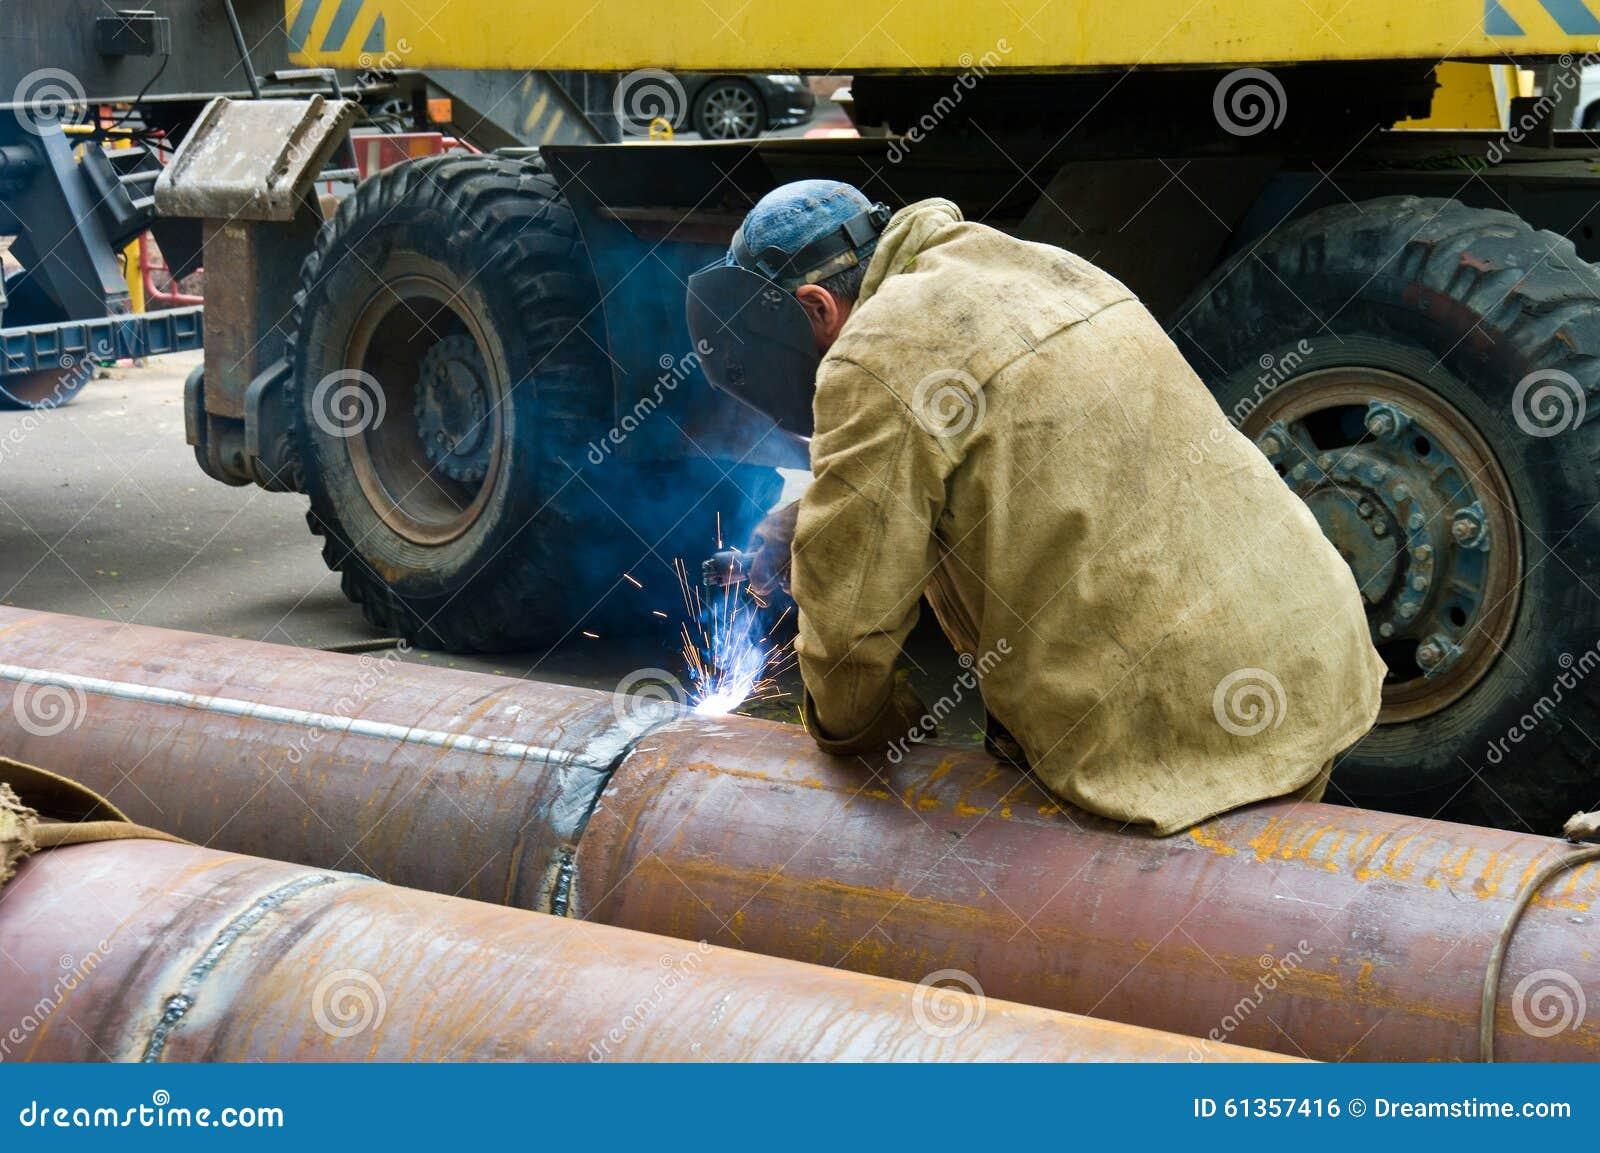 P Pipe Replacement : Welder welds metal construction editorial photo